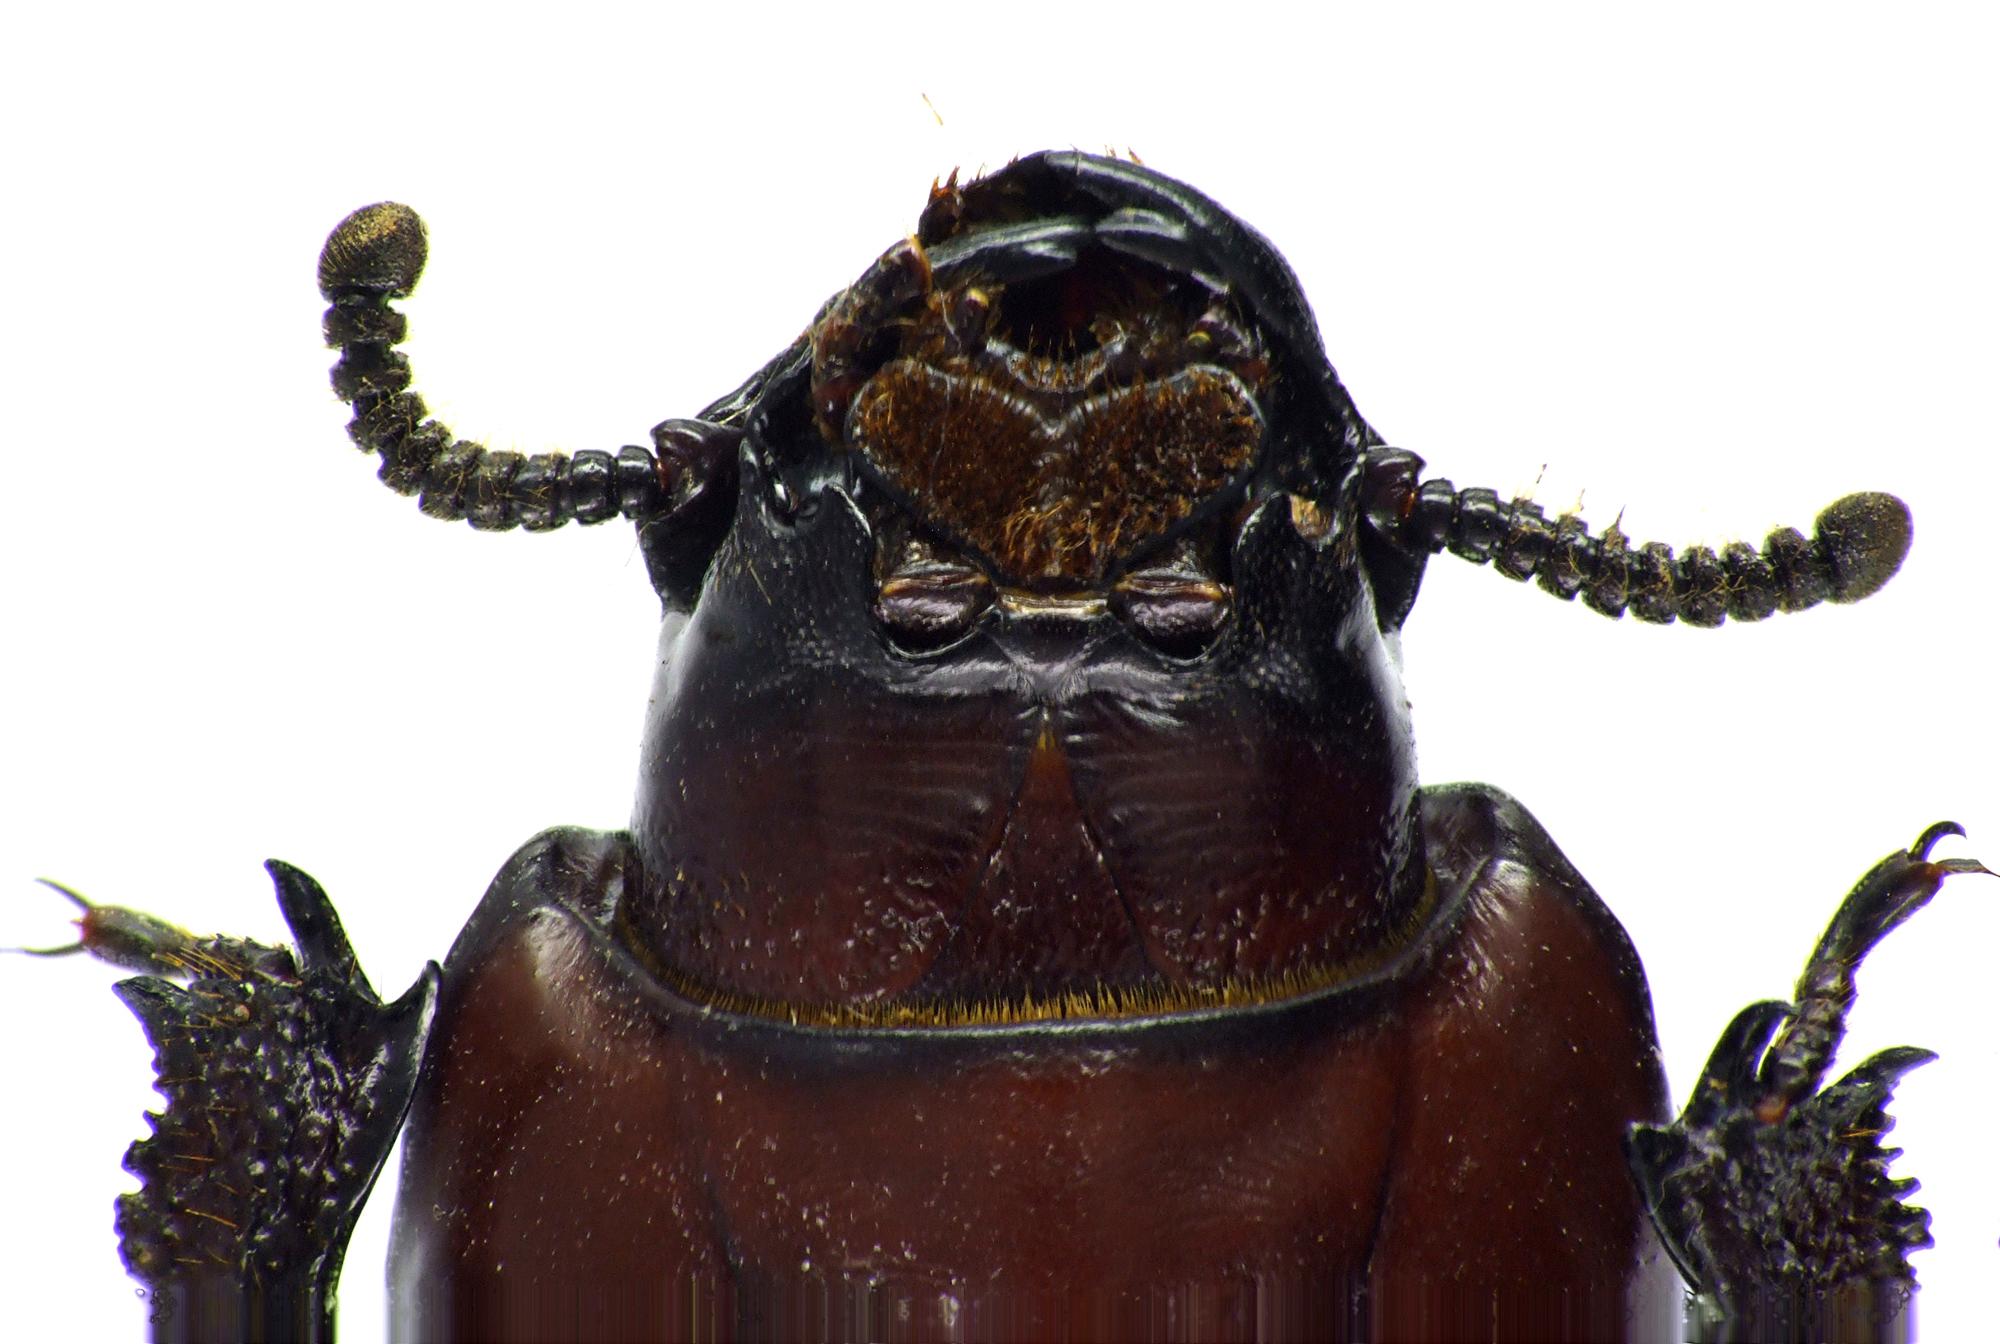 Hemipristula stygica 71686cz93.jpg